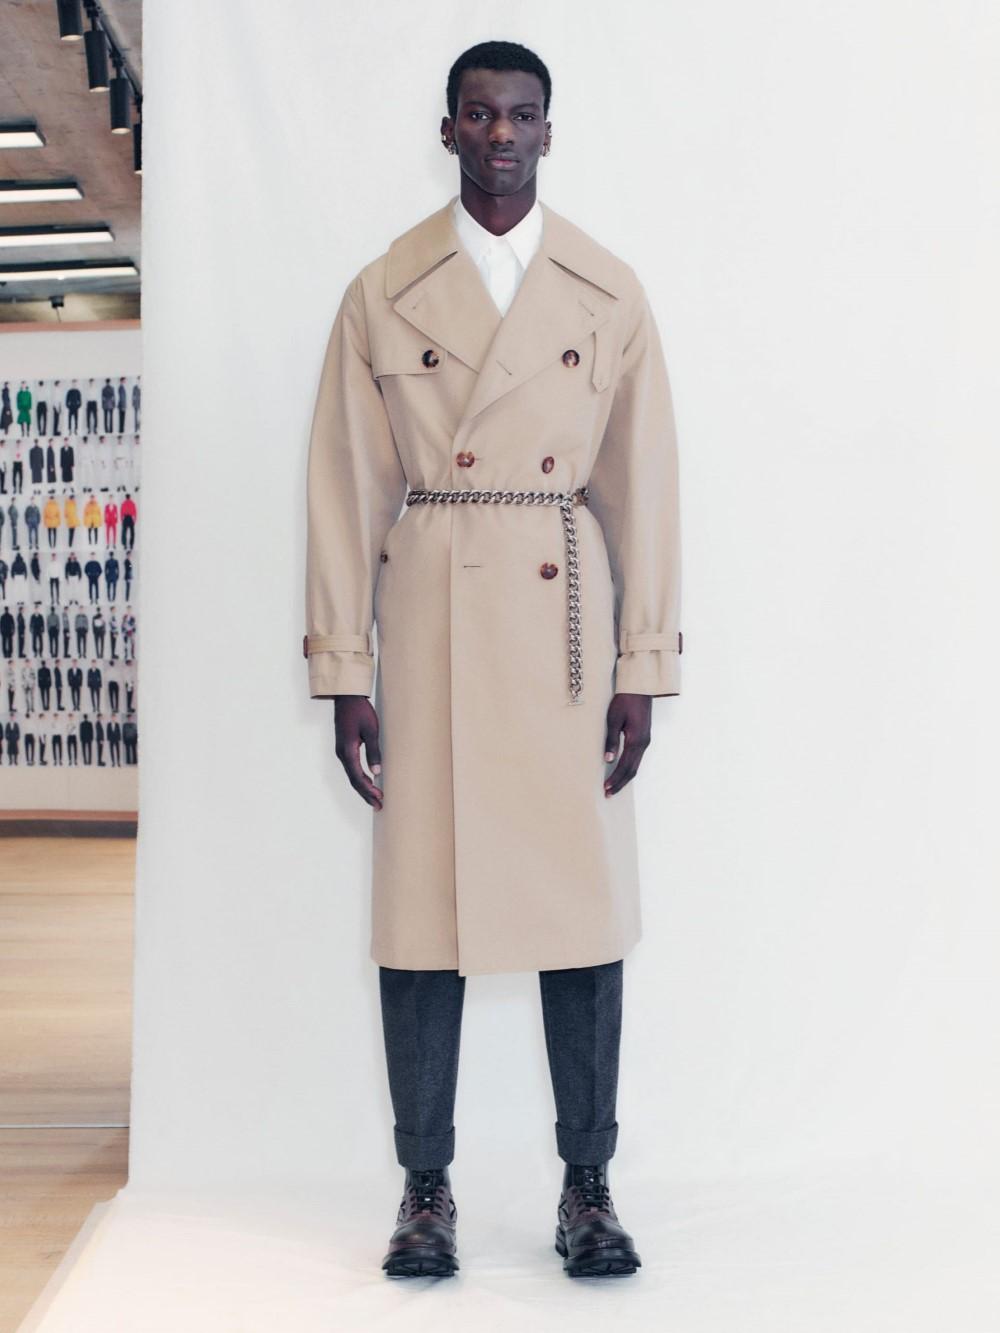 Alexander McQueen Men's Fall Winter 2021